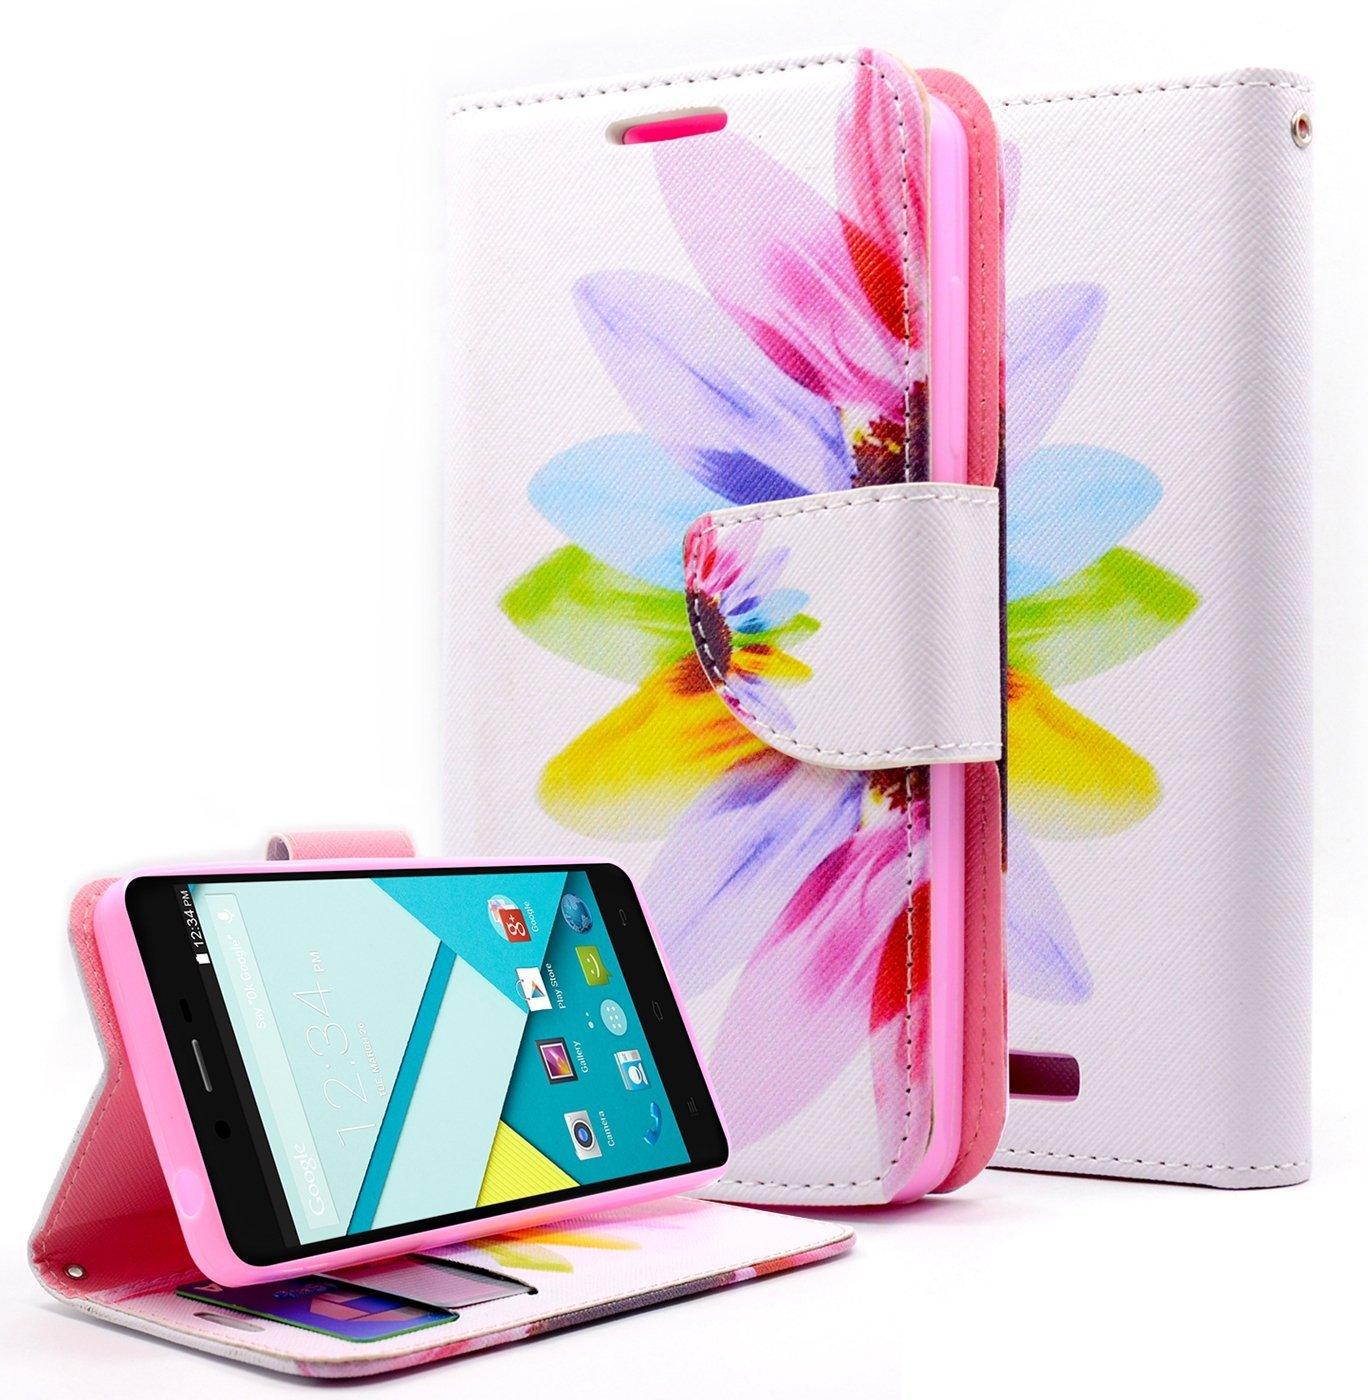 BLU Studio Energy Case, NageBee - BLU Studio Energy Design Dual-Use Flip PU Leather Fold Wallet Pouch Case for BLU Studio Energy D810L (AT & T, Metro PCS, T-Mobile) (Wallet Sunrise)